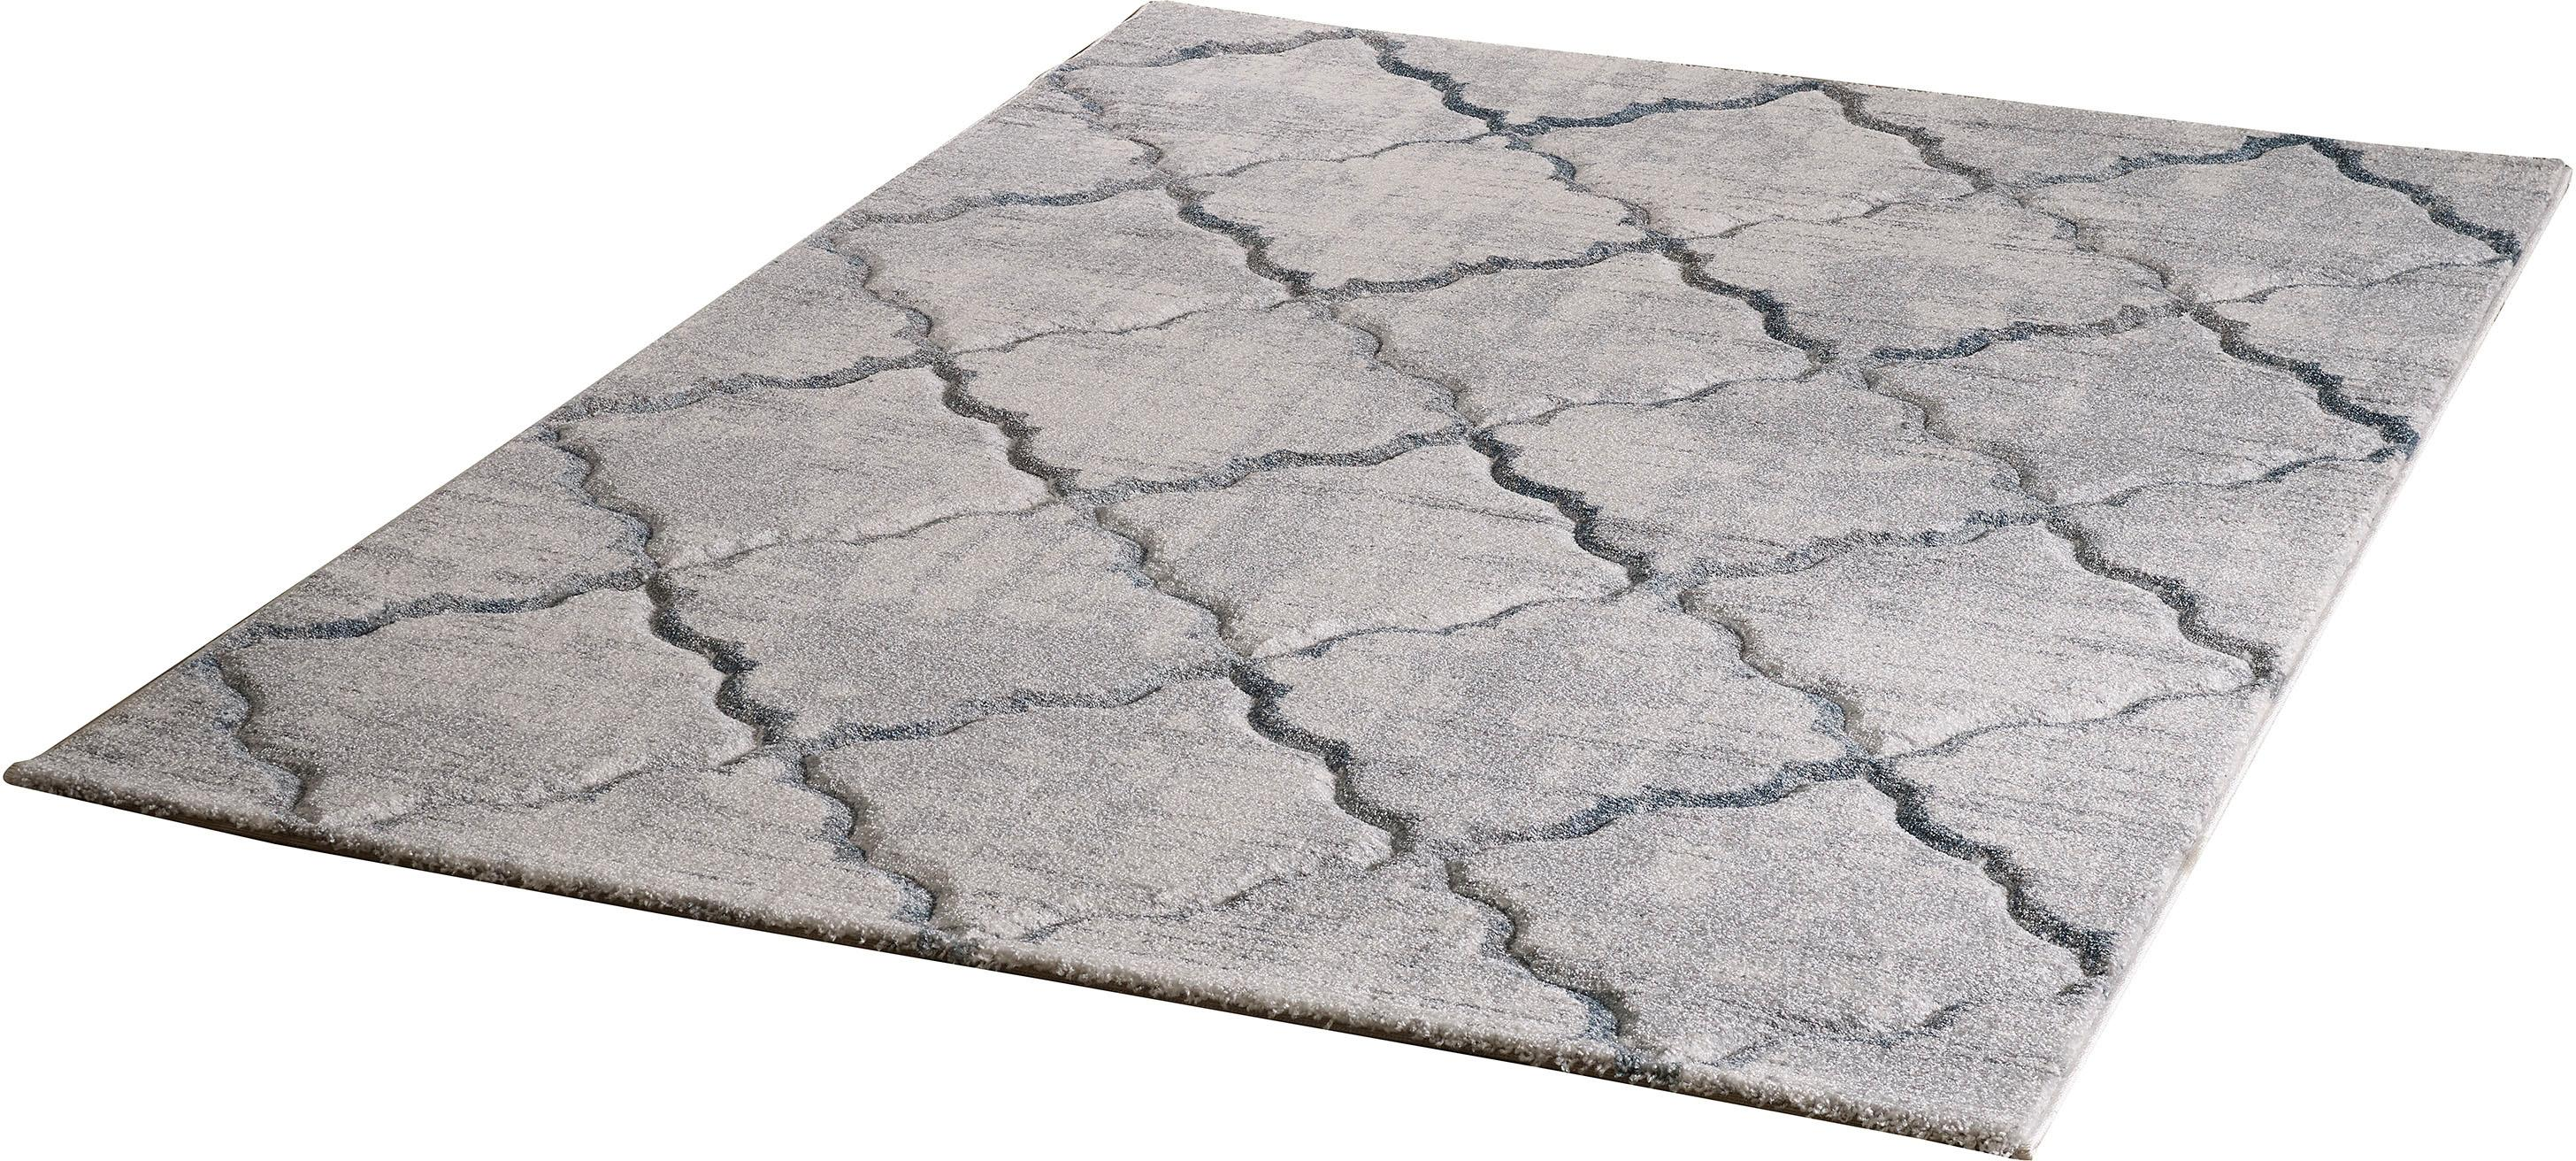 Teppich Lorena 2904 Sanat Teppiche rechteckig Höhe 13 mm maschinell gewebt